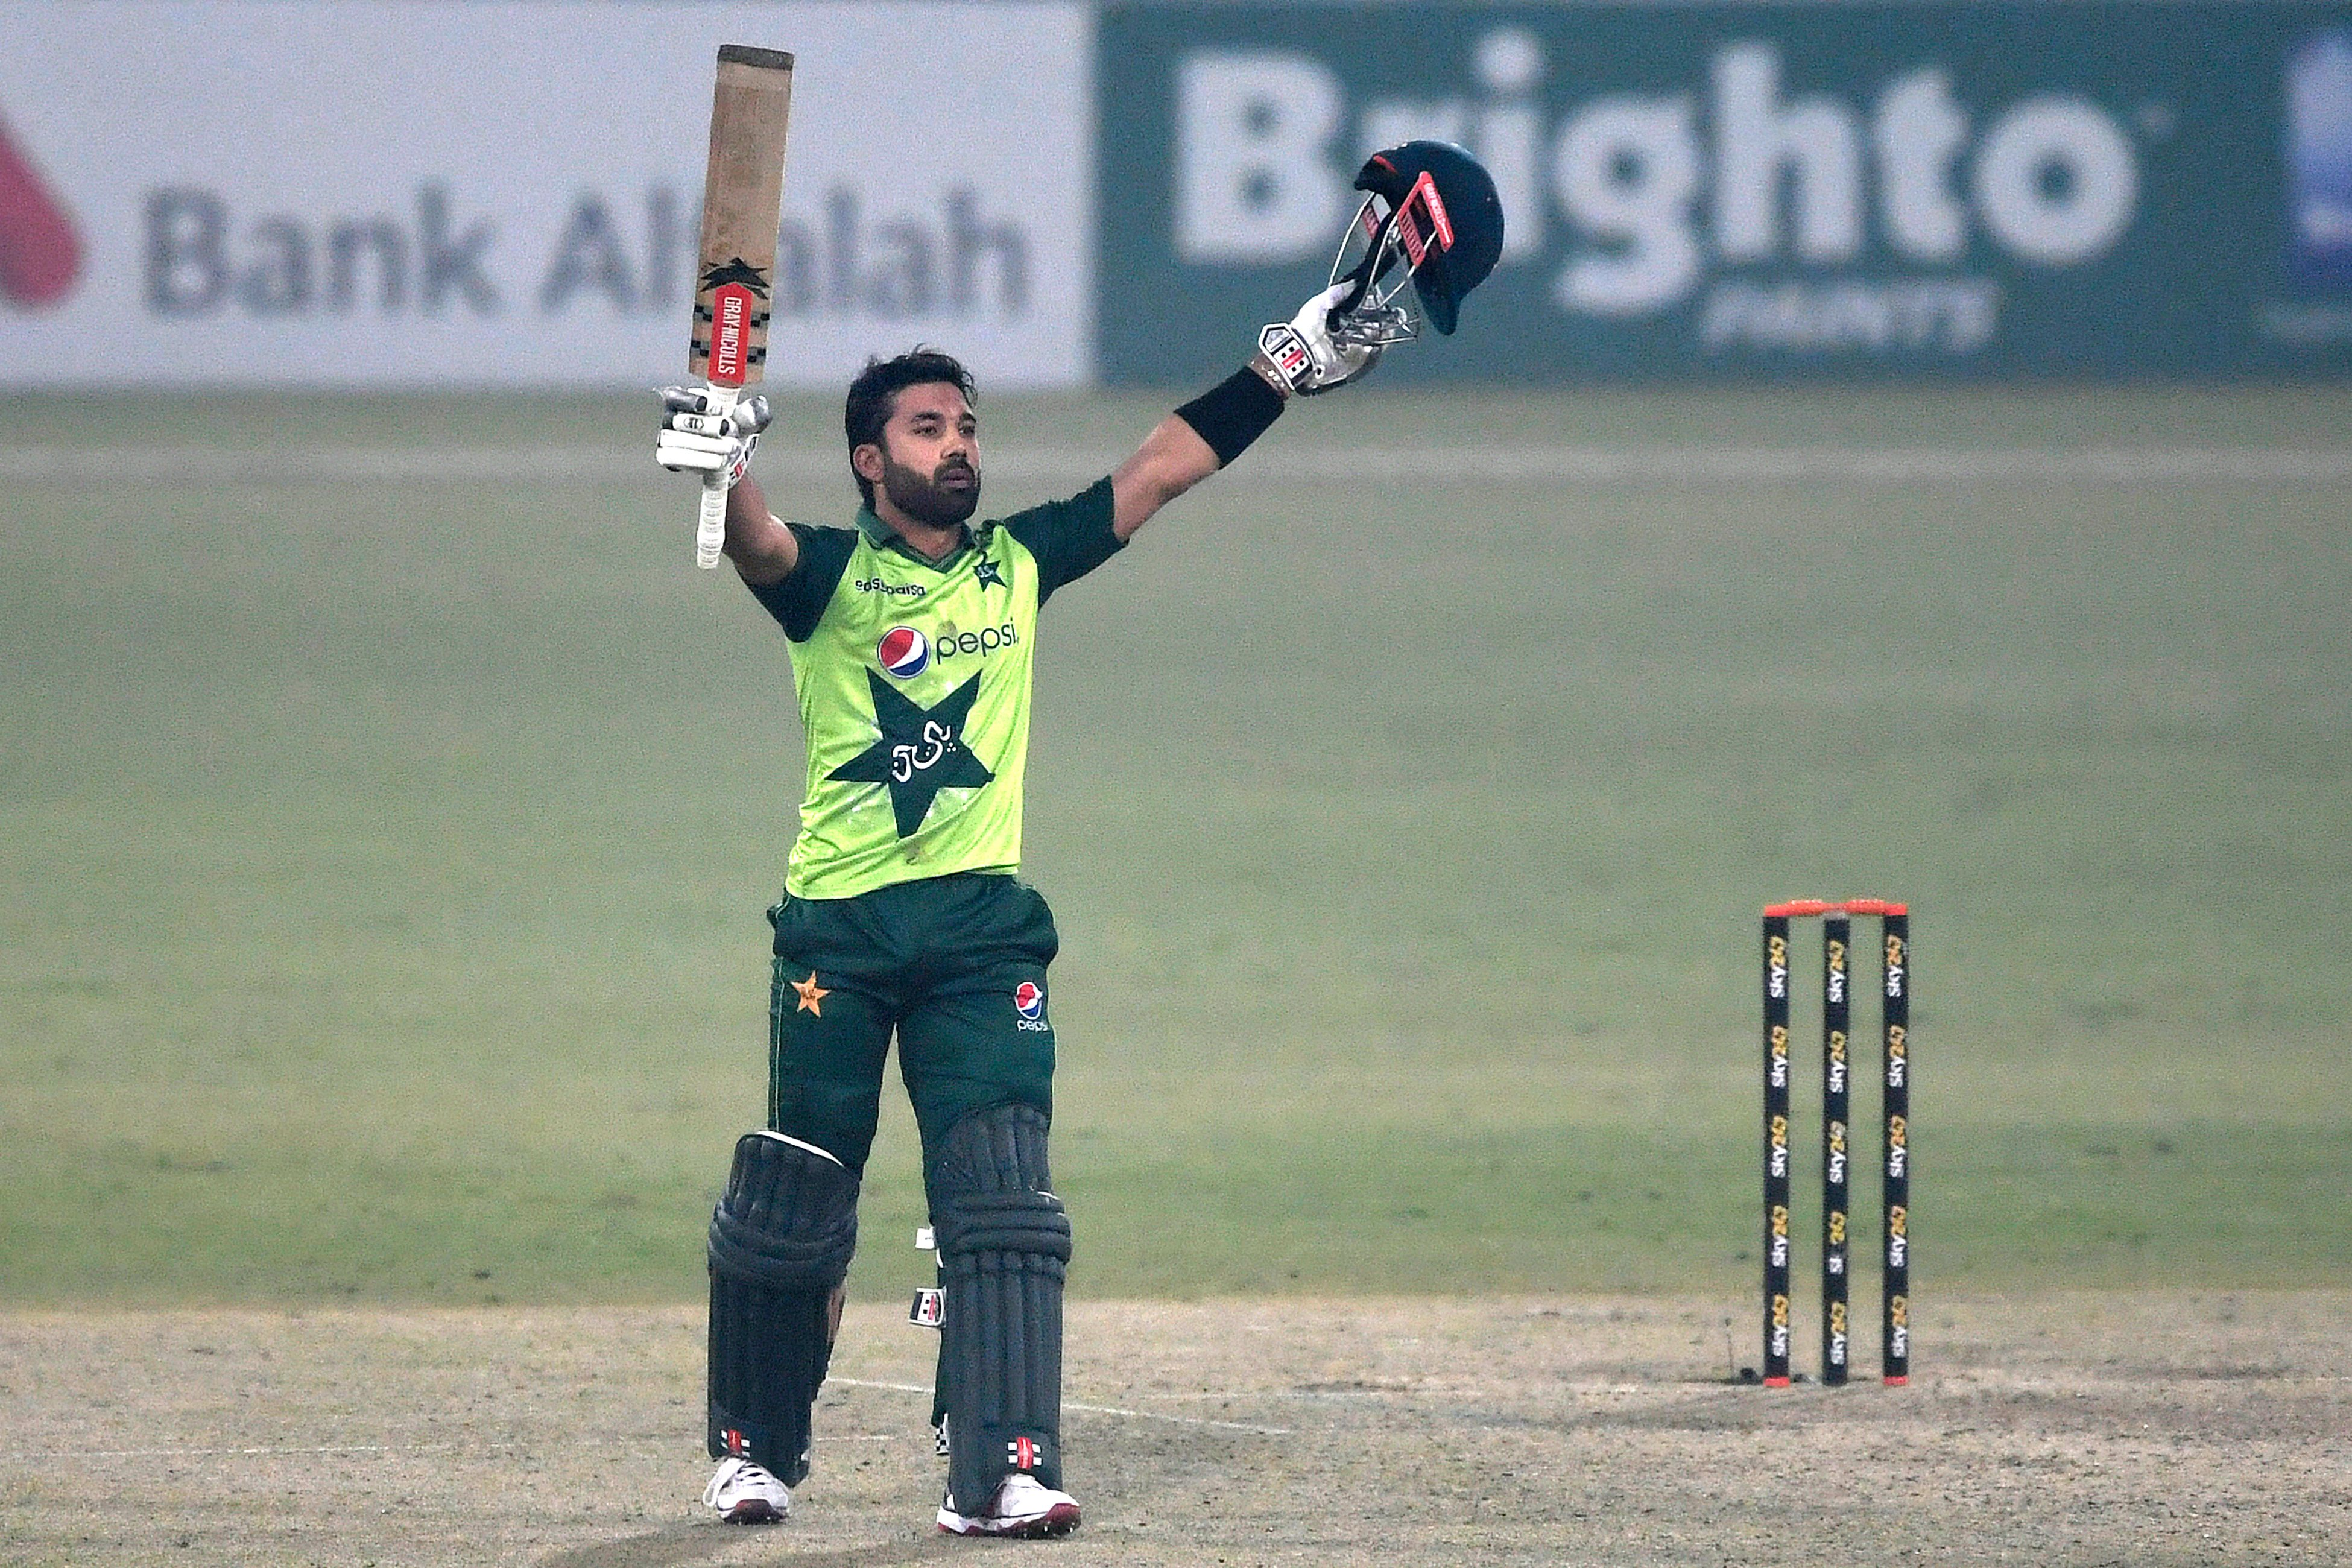 Rizwan's first T20I century helps Pakistan win the series opener - International Cricket Council